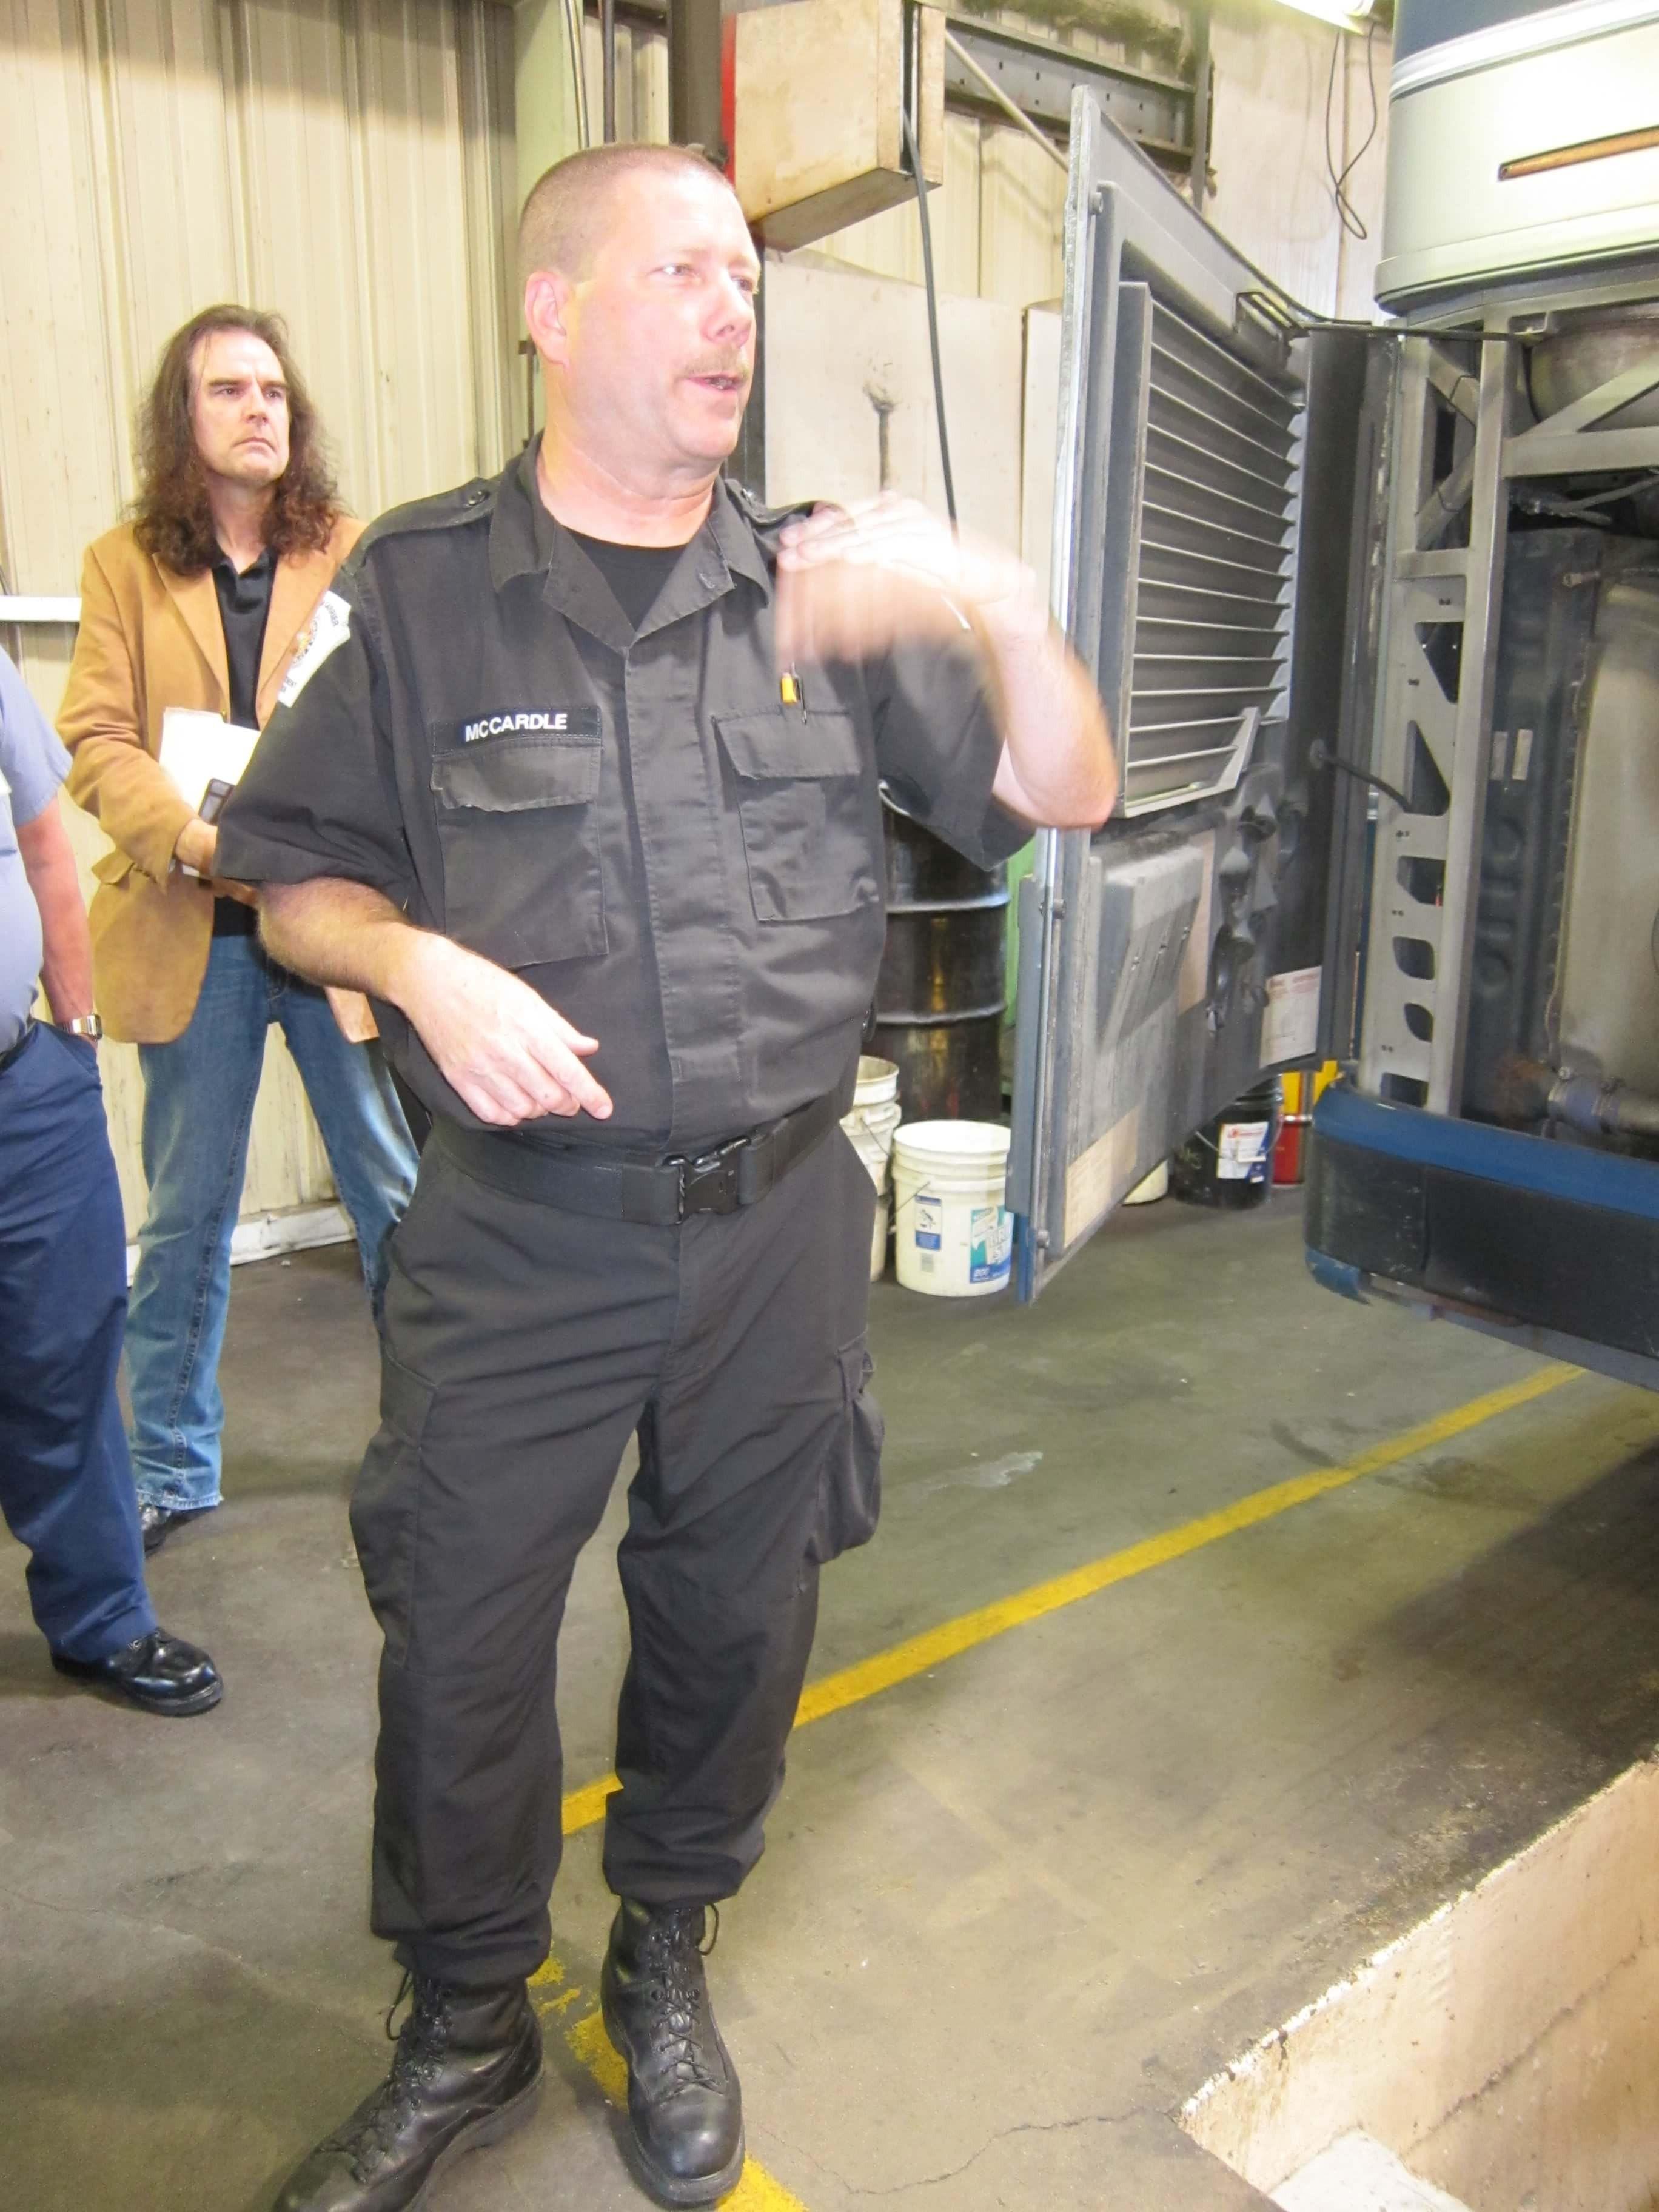 Trooper at Garage